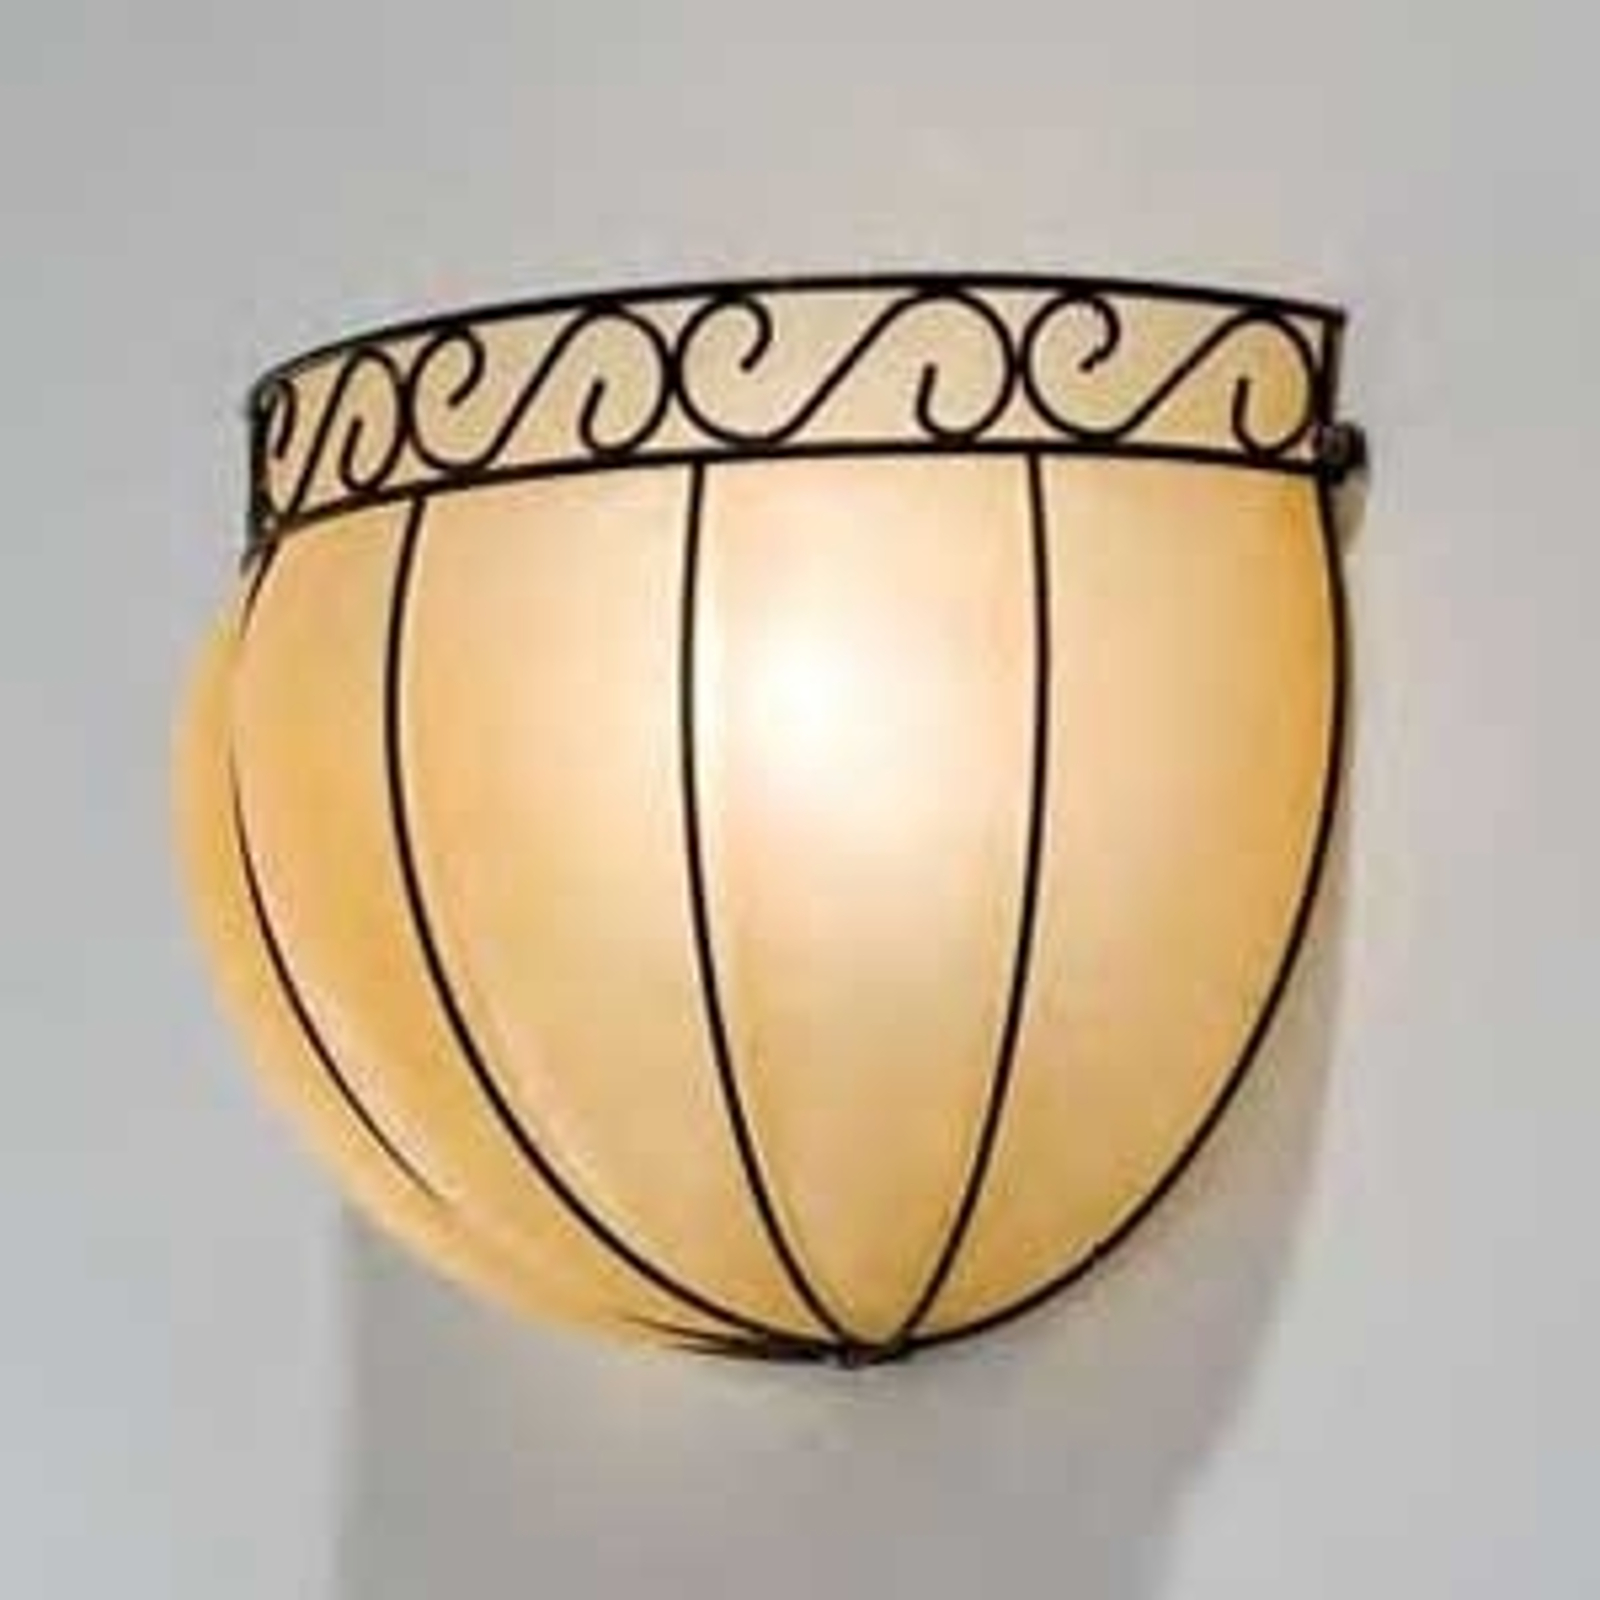 CORONA halvrund væglampe 34 cm